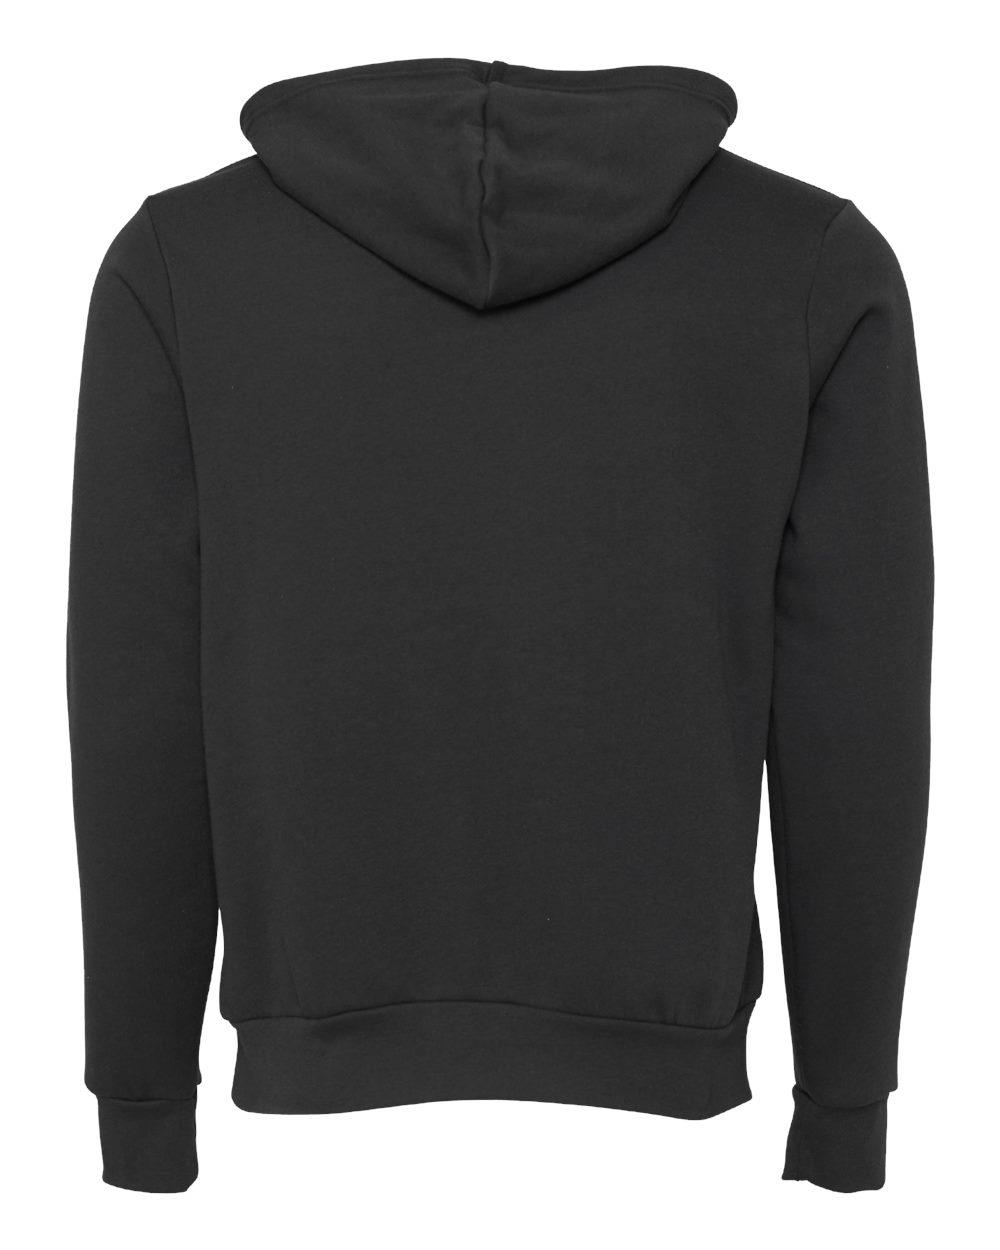 Bella-Canvas-Unisex-Sponge-Hooded-Pullover-Sweatshirt-Blank-3719-up-to-2XL thumbnail 32